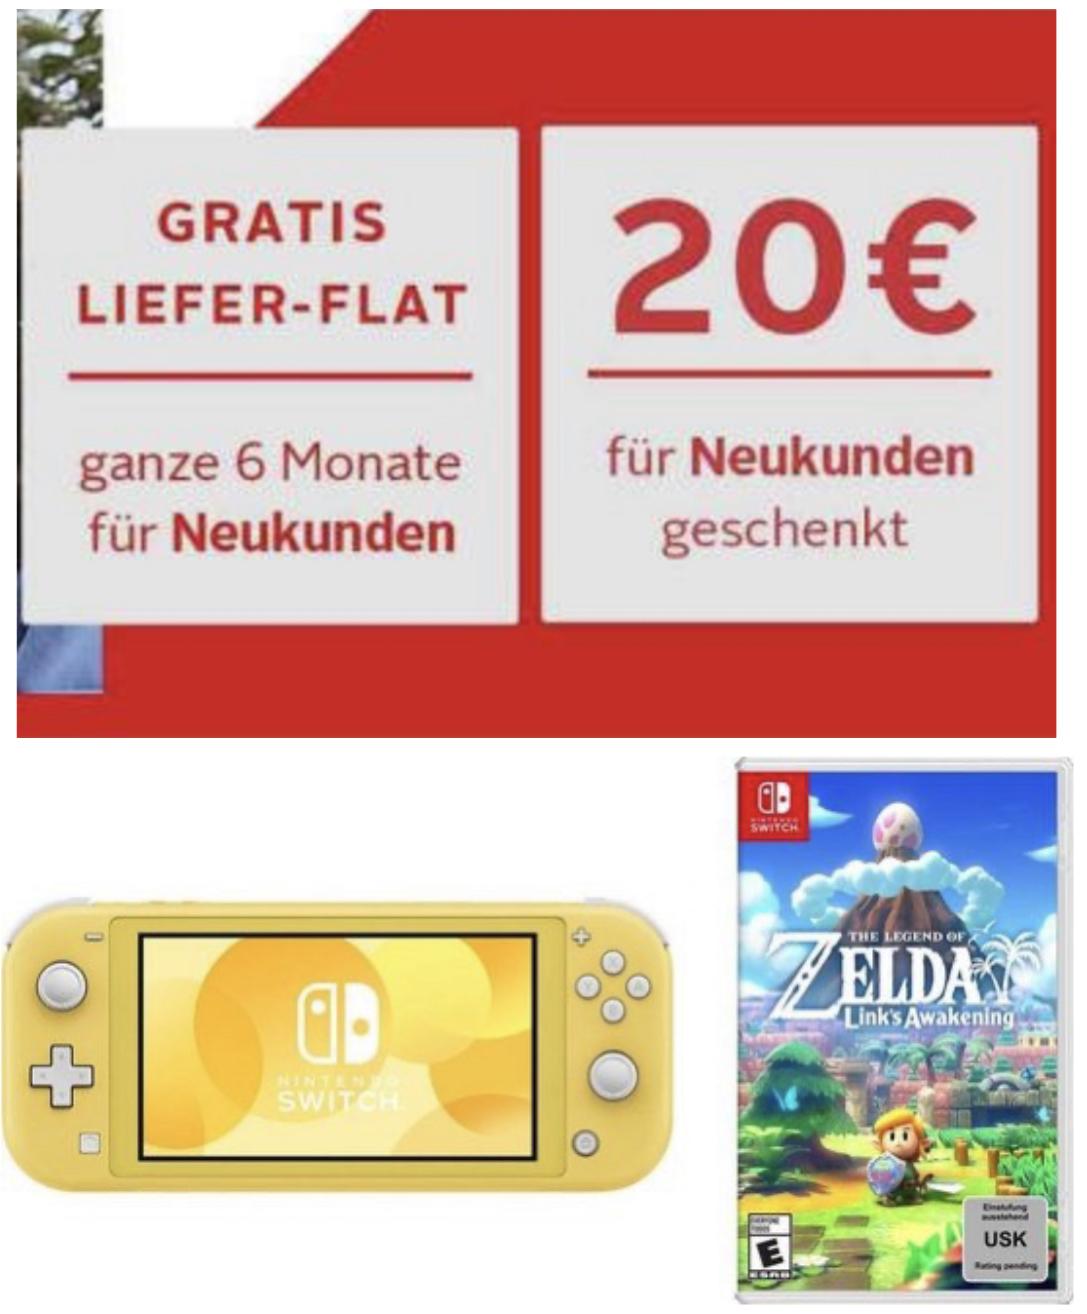 OTTO App Neukunde: Jetzt 20€ Rabatt + 5% auf alles - z.B. Animal Crossing New Horizons 36,99€ / Switch Lite + Zelda Link's Awakening 197,55€